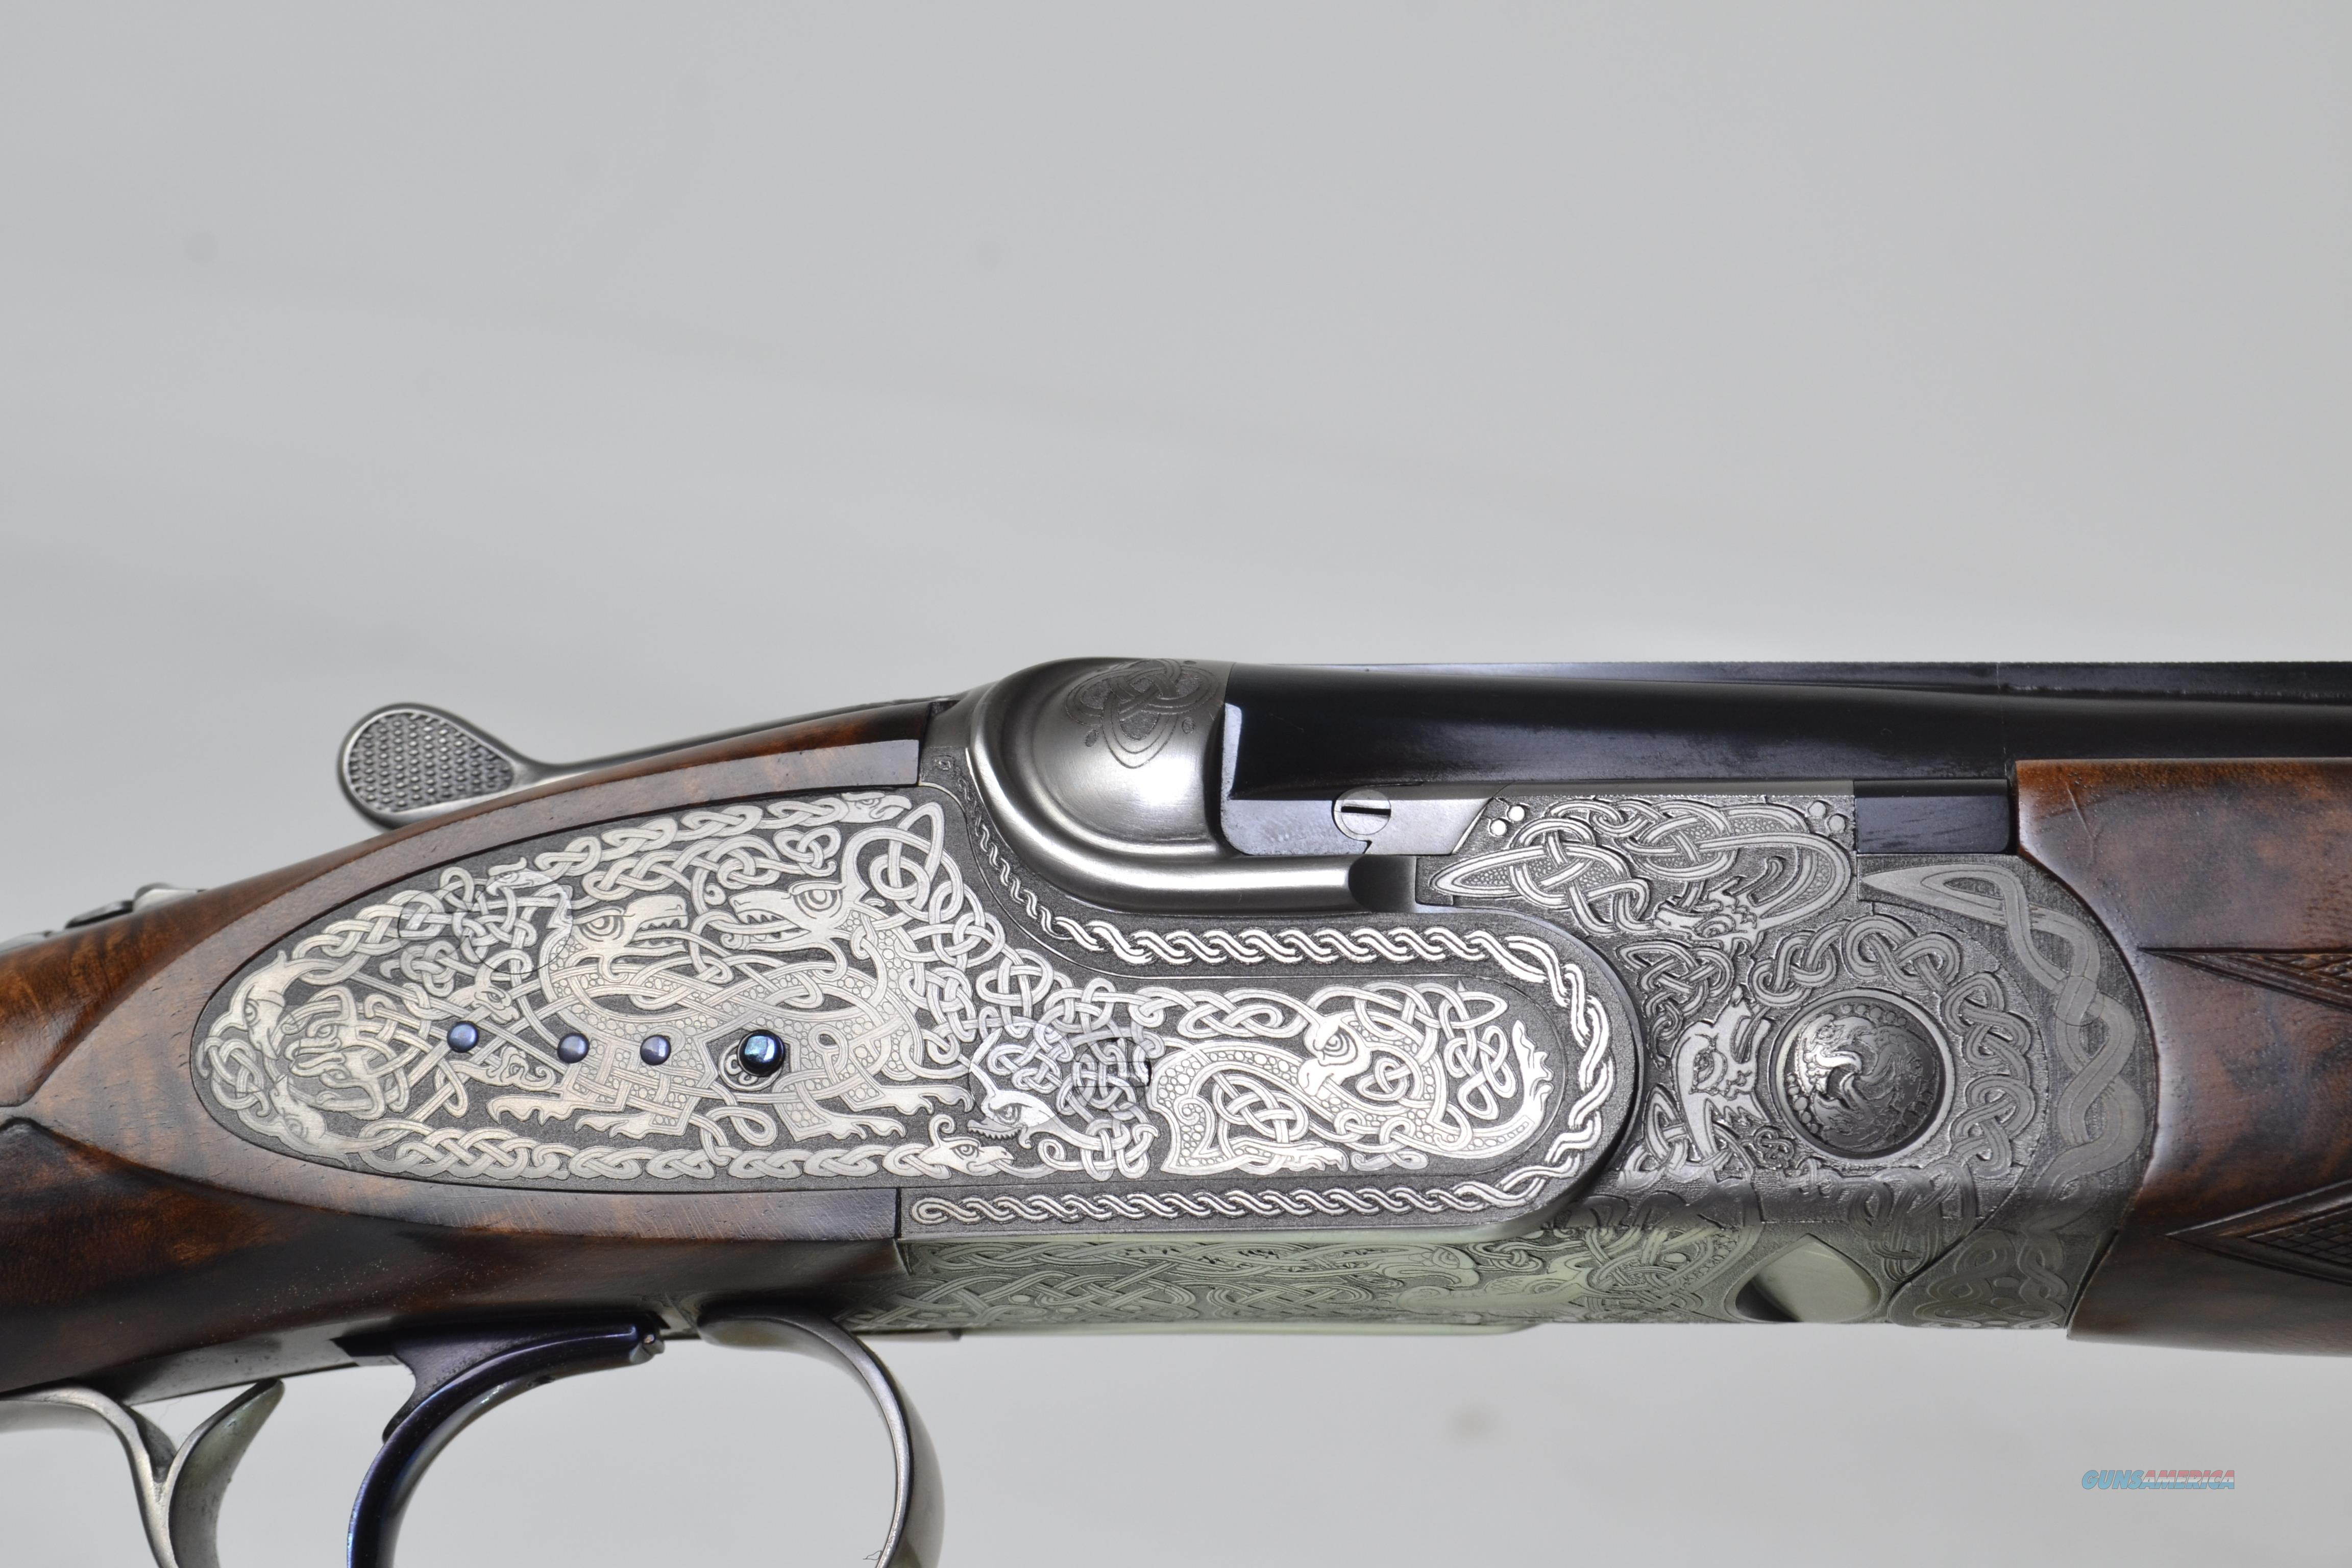 "CSMC - Christian Hunter, New Celtic Engraved, 20ga. 28"" Barrels with Screw in Choke Tubes  Guns > Shotguns > Connecticut (Galazan) Shotguns"